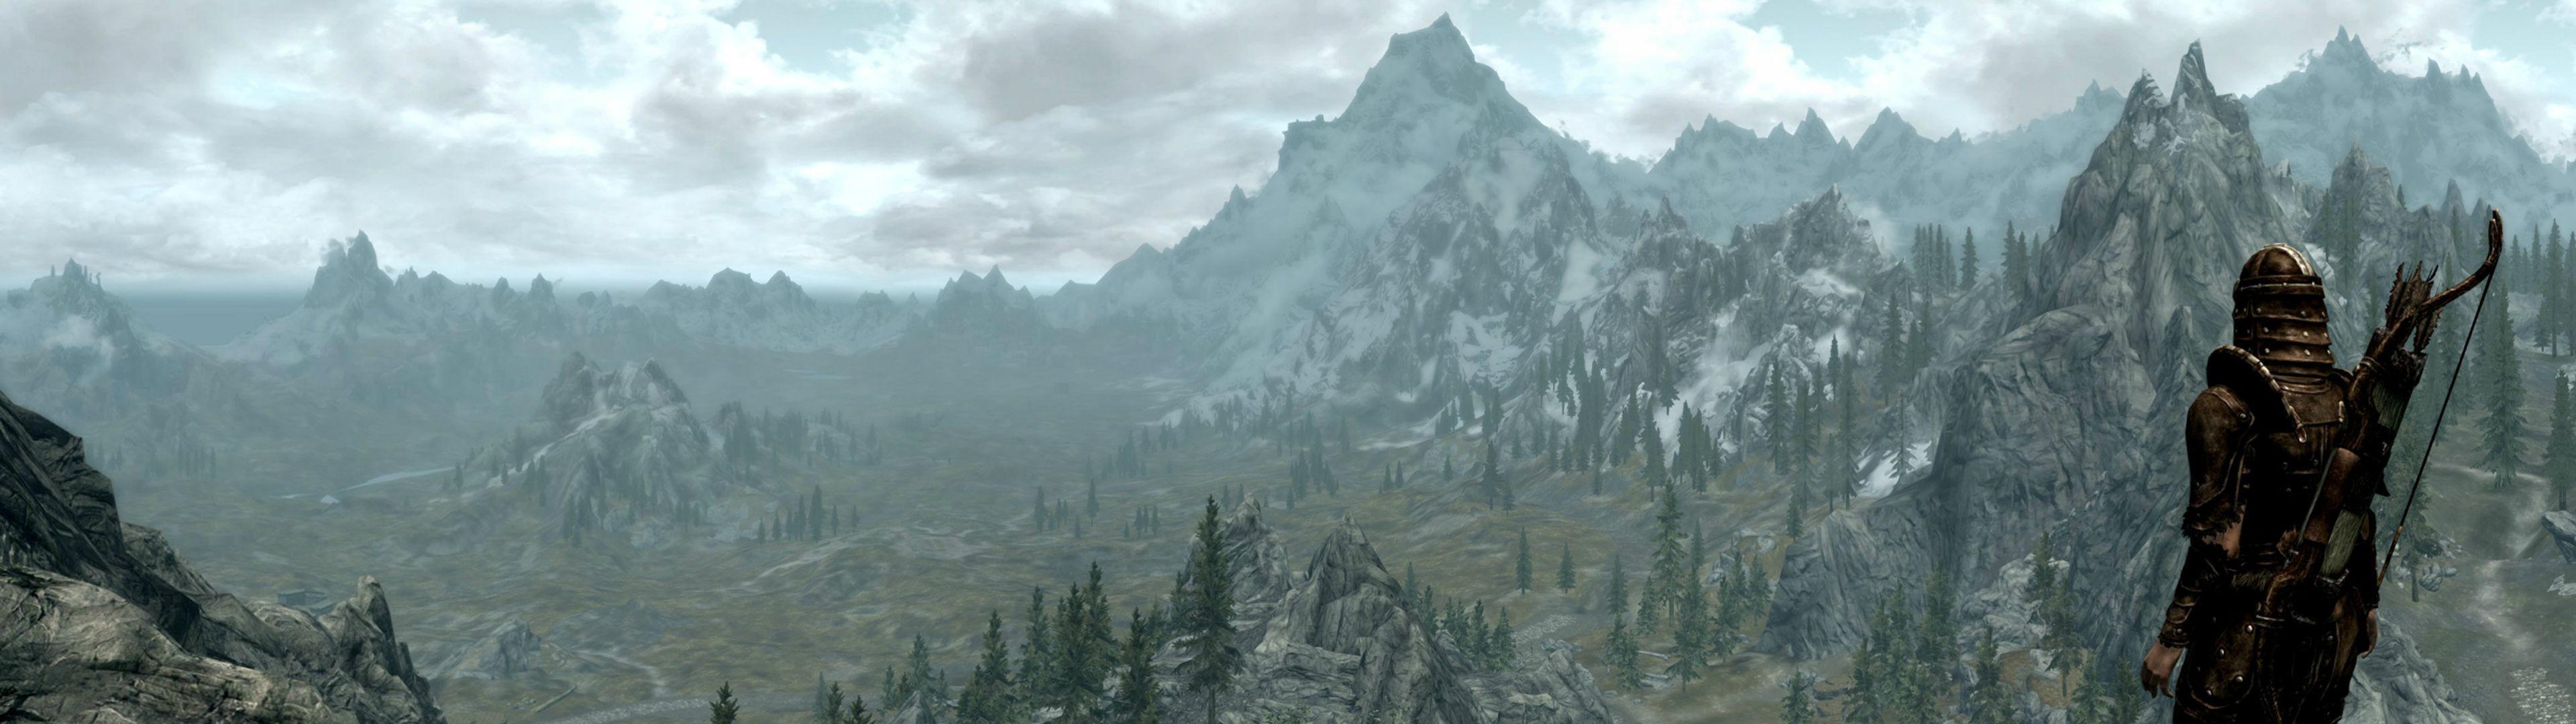 Skyrim Panoramic I Made [3840 x 1080] : wallpapers